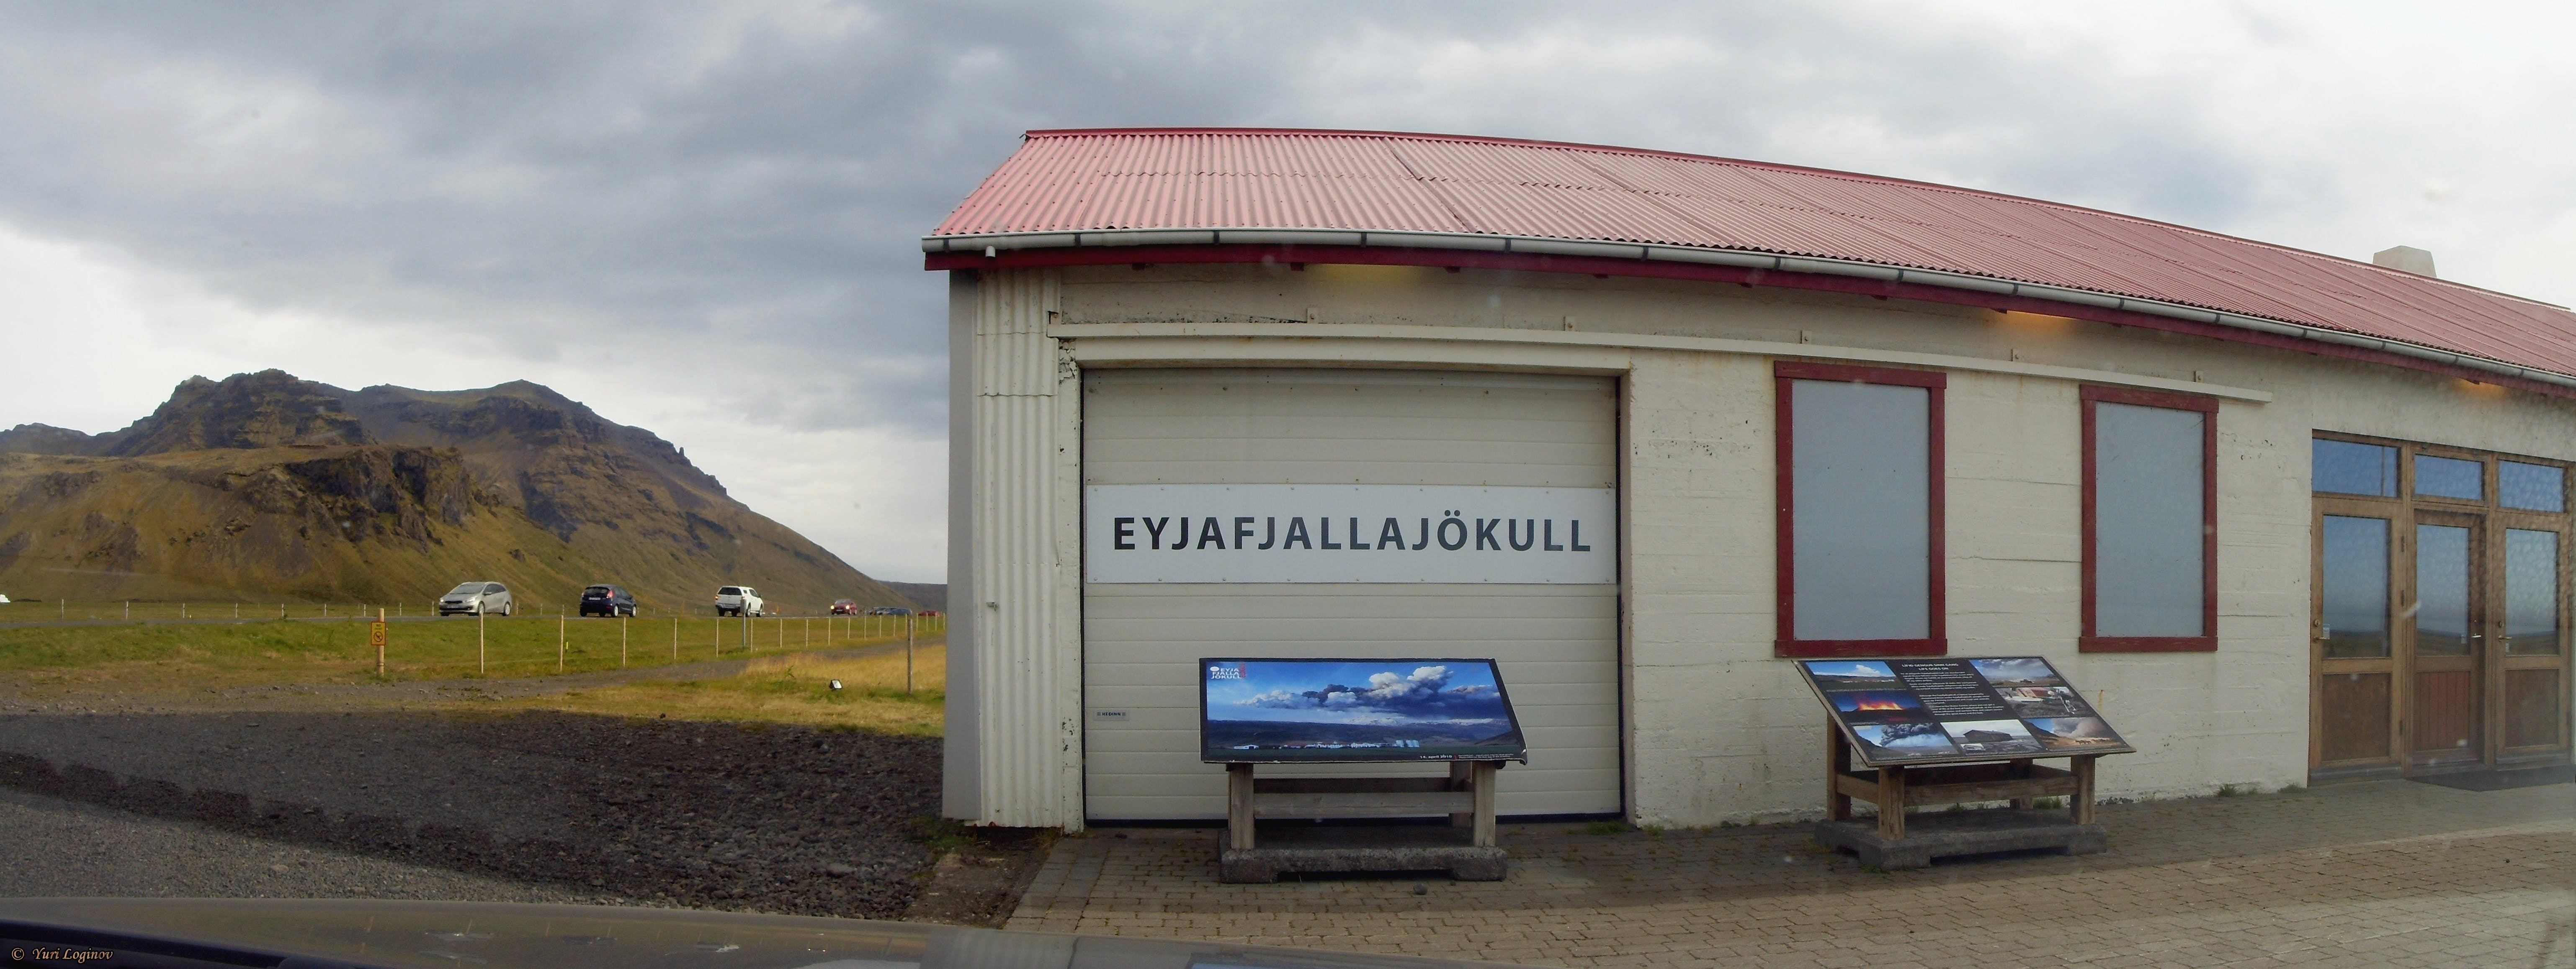 Free stock photo of iceland, eyjafjallajokull, Suðurland, Hringvegur